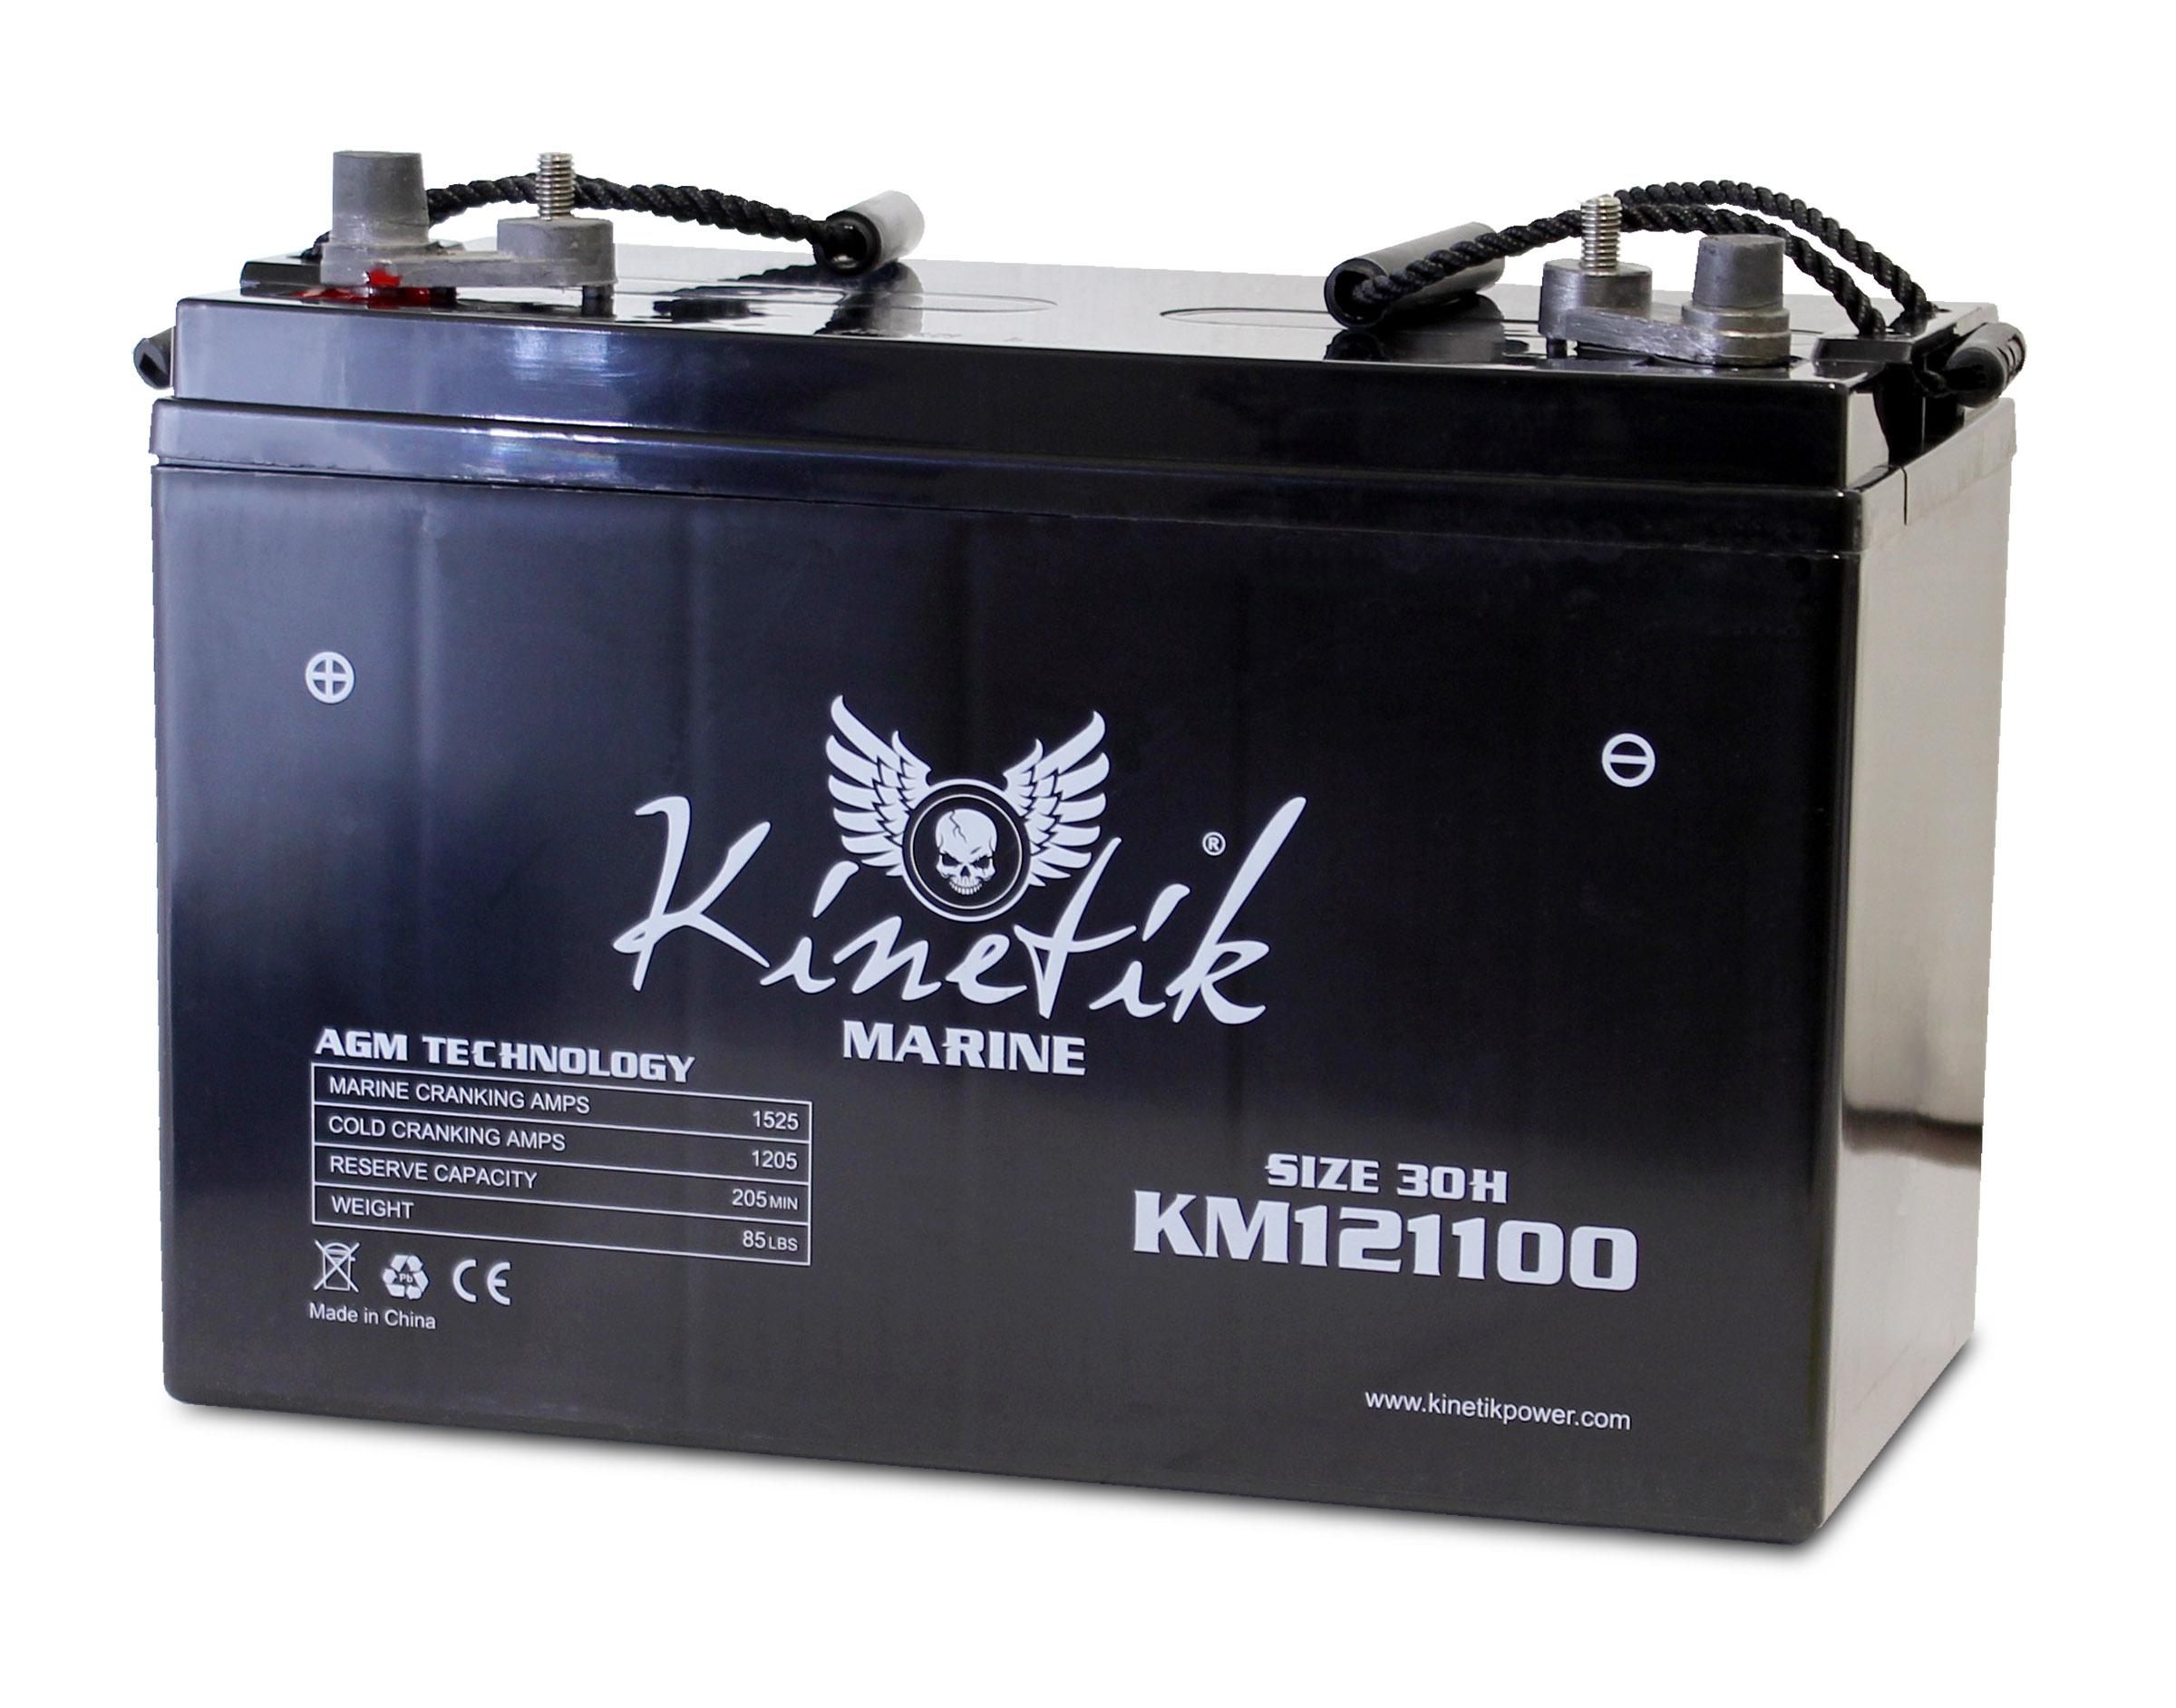 12V 110AH Group 30H Battery for Minn-Kota Camo Waterfowl Edition